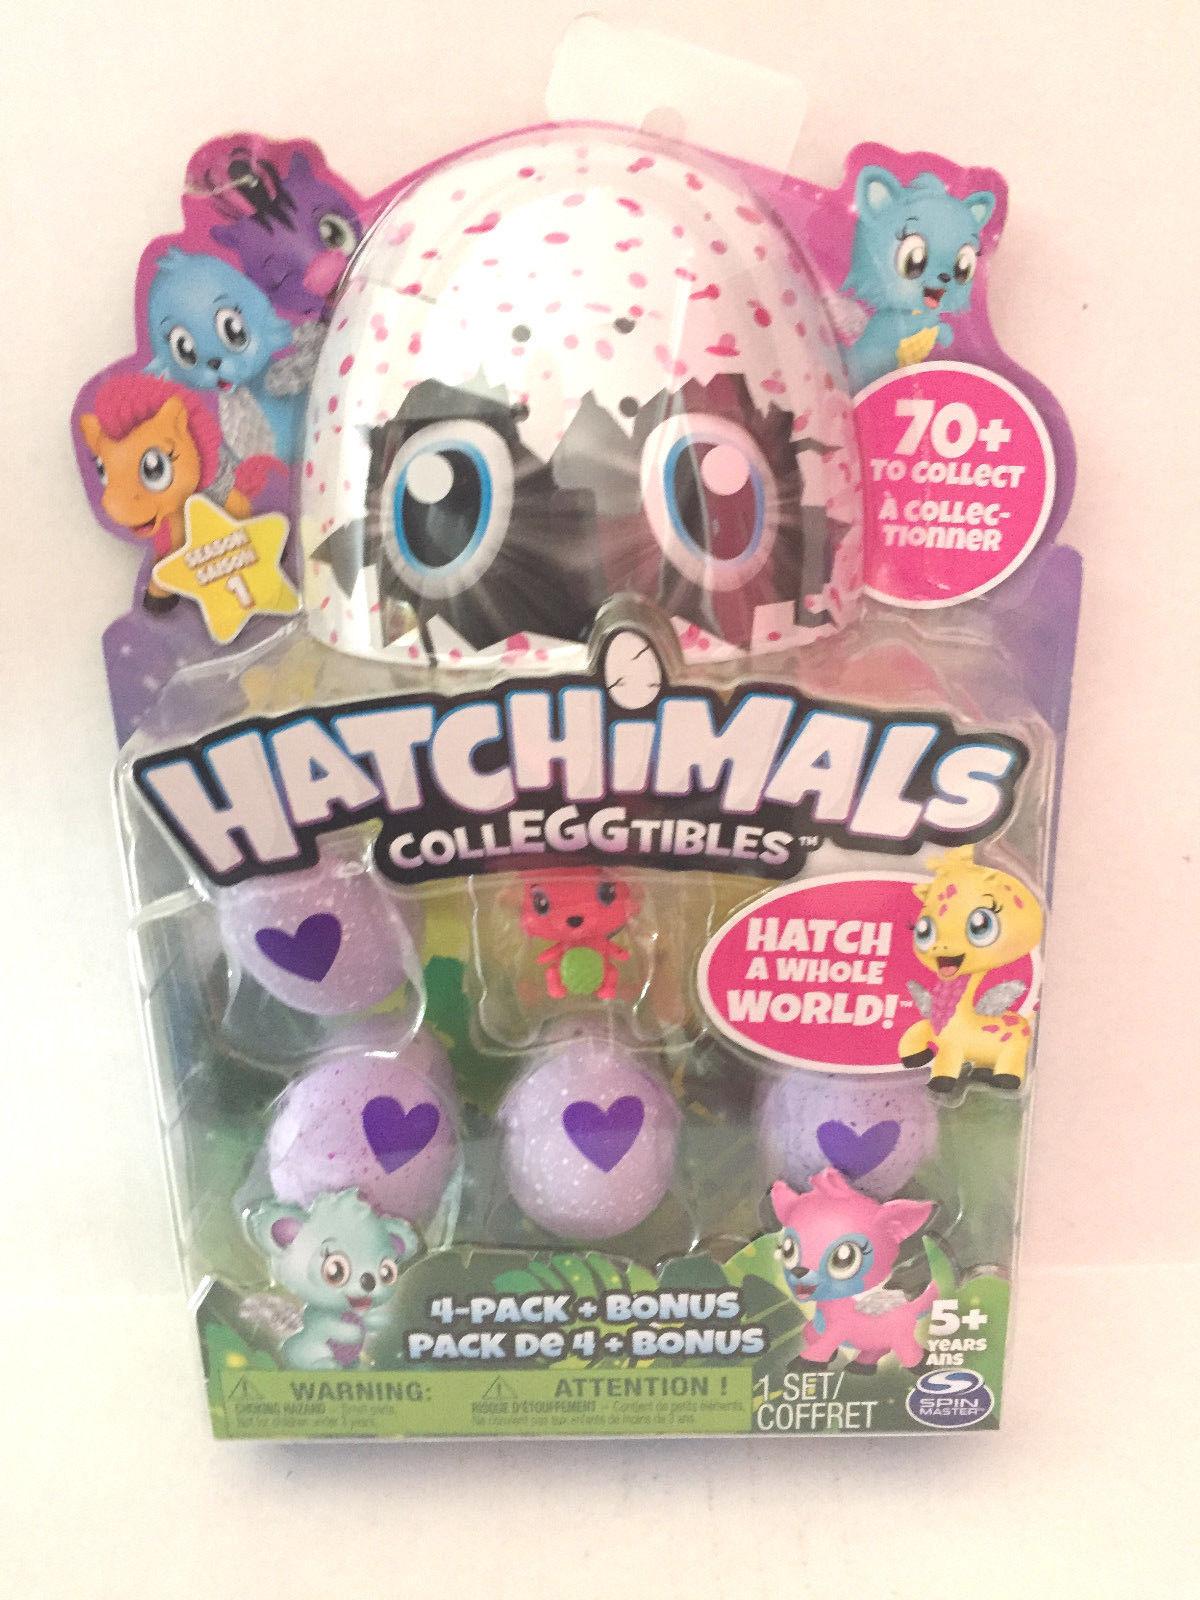 Hatchimals CollEGGtibles 4 Pack+ Bonus Season 1 Hatch A Whole World!